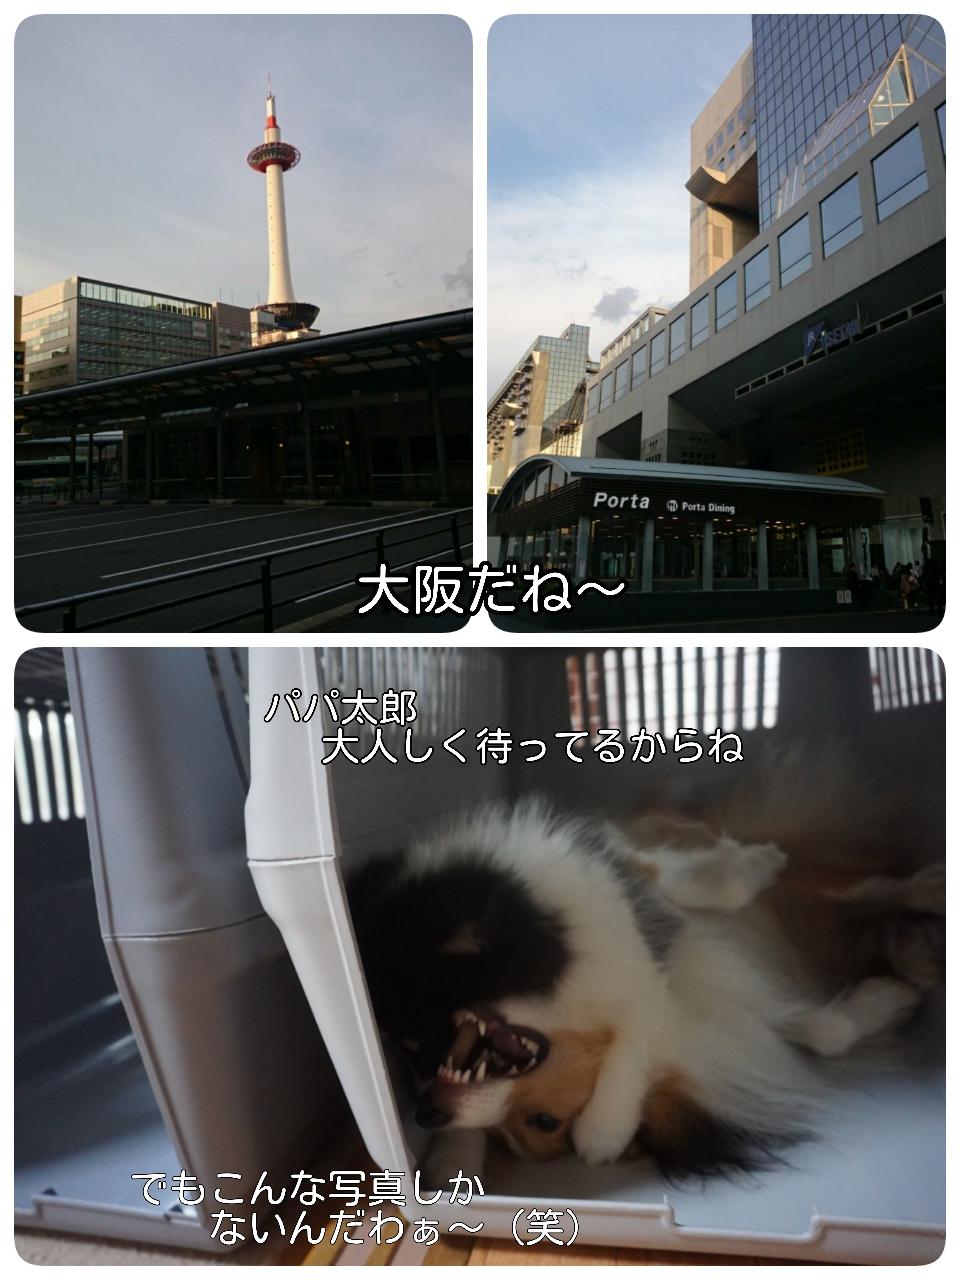 2015-06-02-06-25-59_deco.jpg